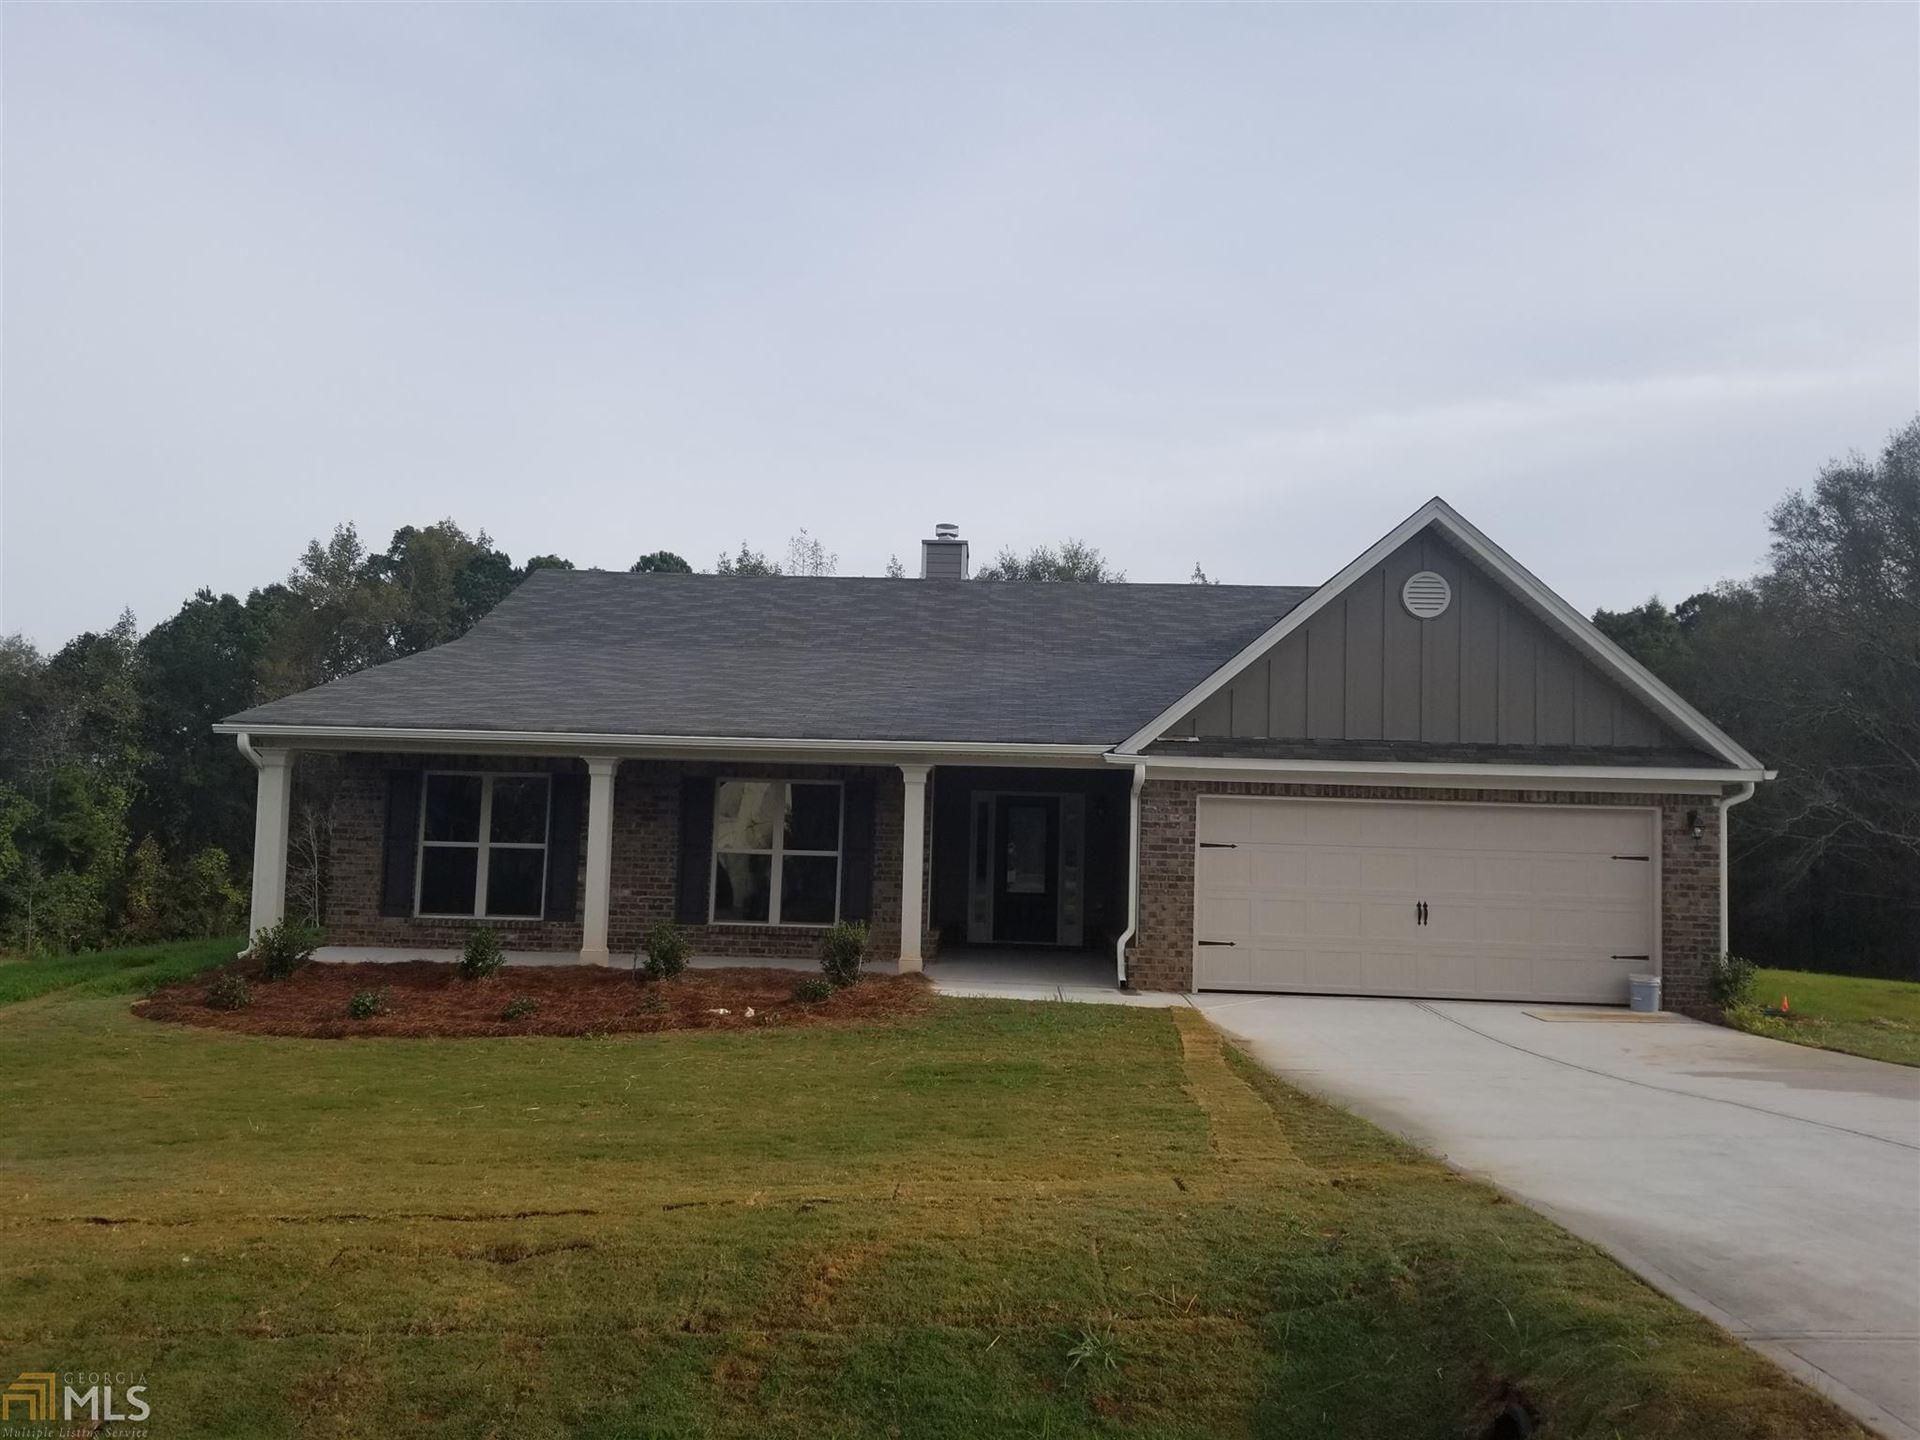 21 Heartland Cir, Winder, GA 30680 - MLS#: 8862896